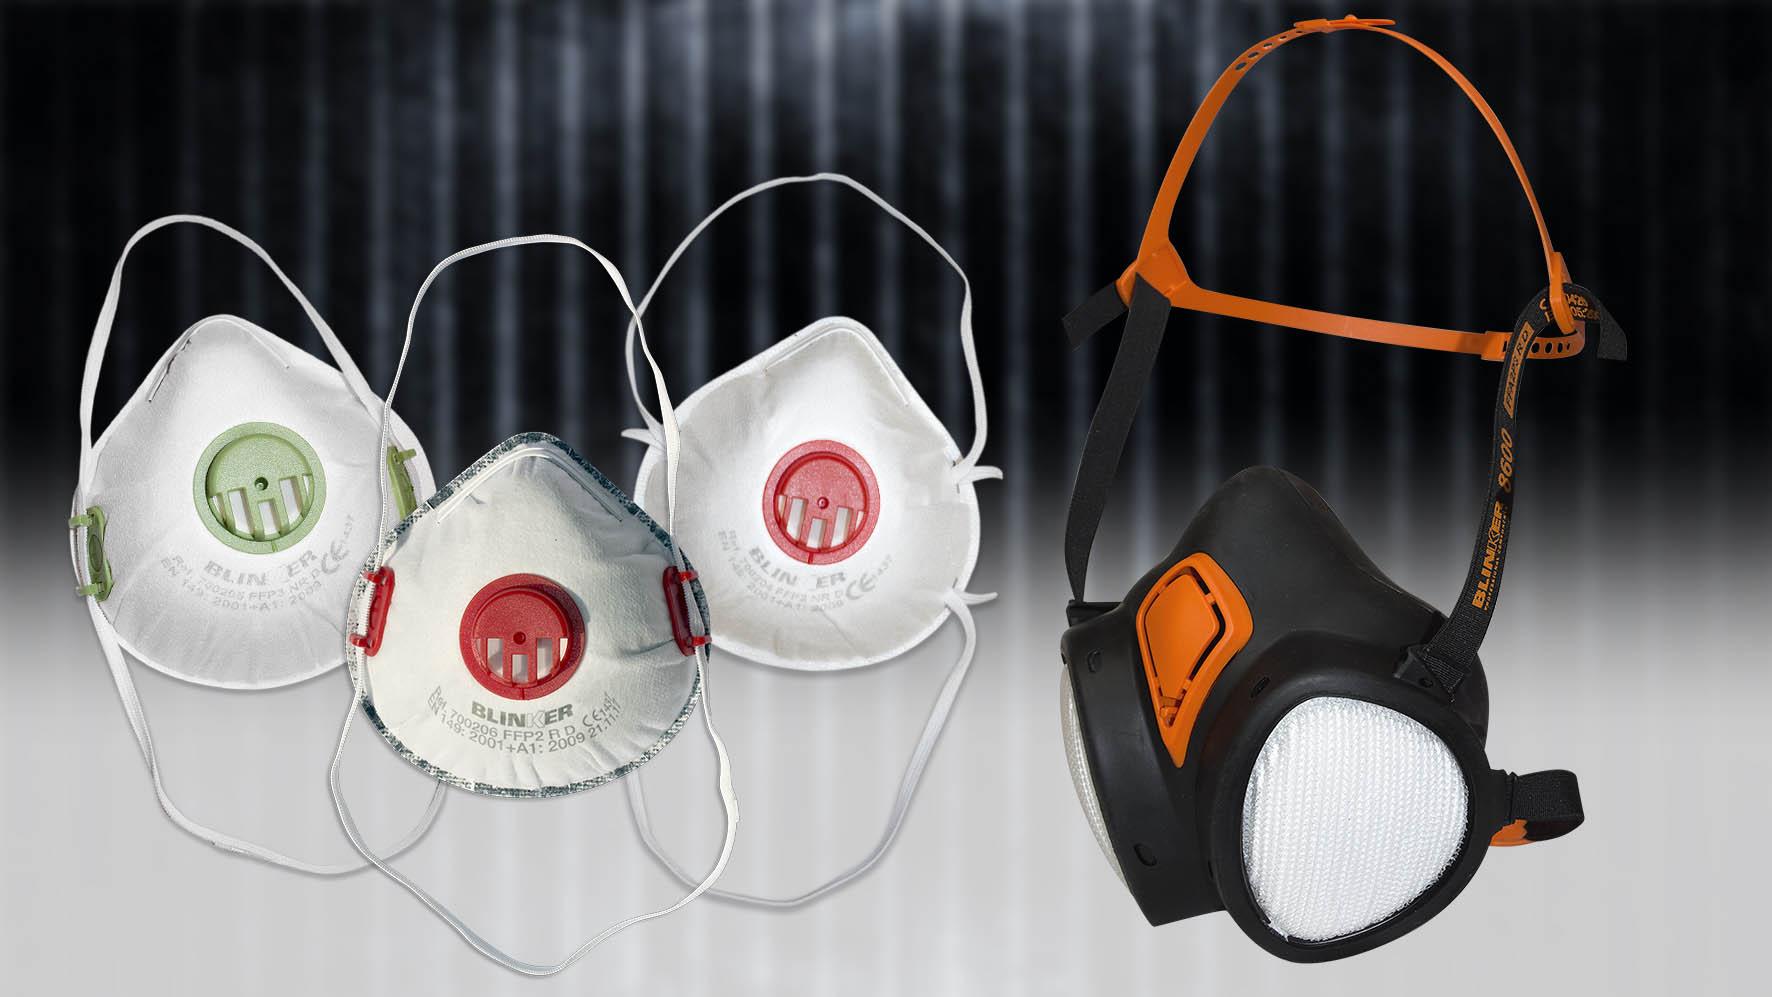 como-elegir-una-mascarilla-facial-de-proteccion-respiratoria